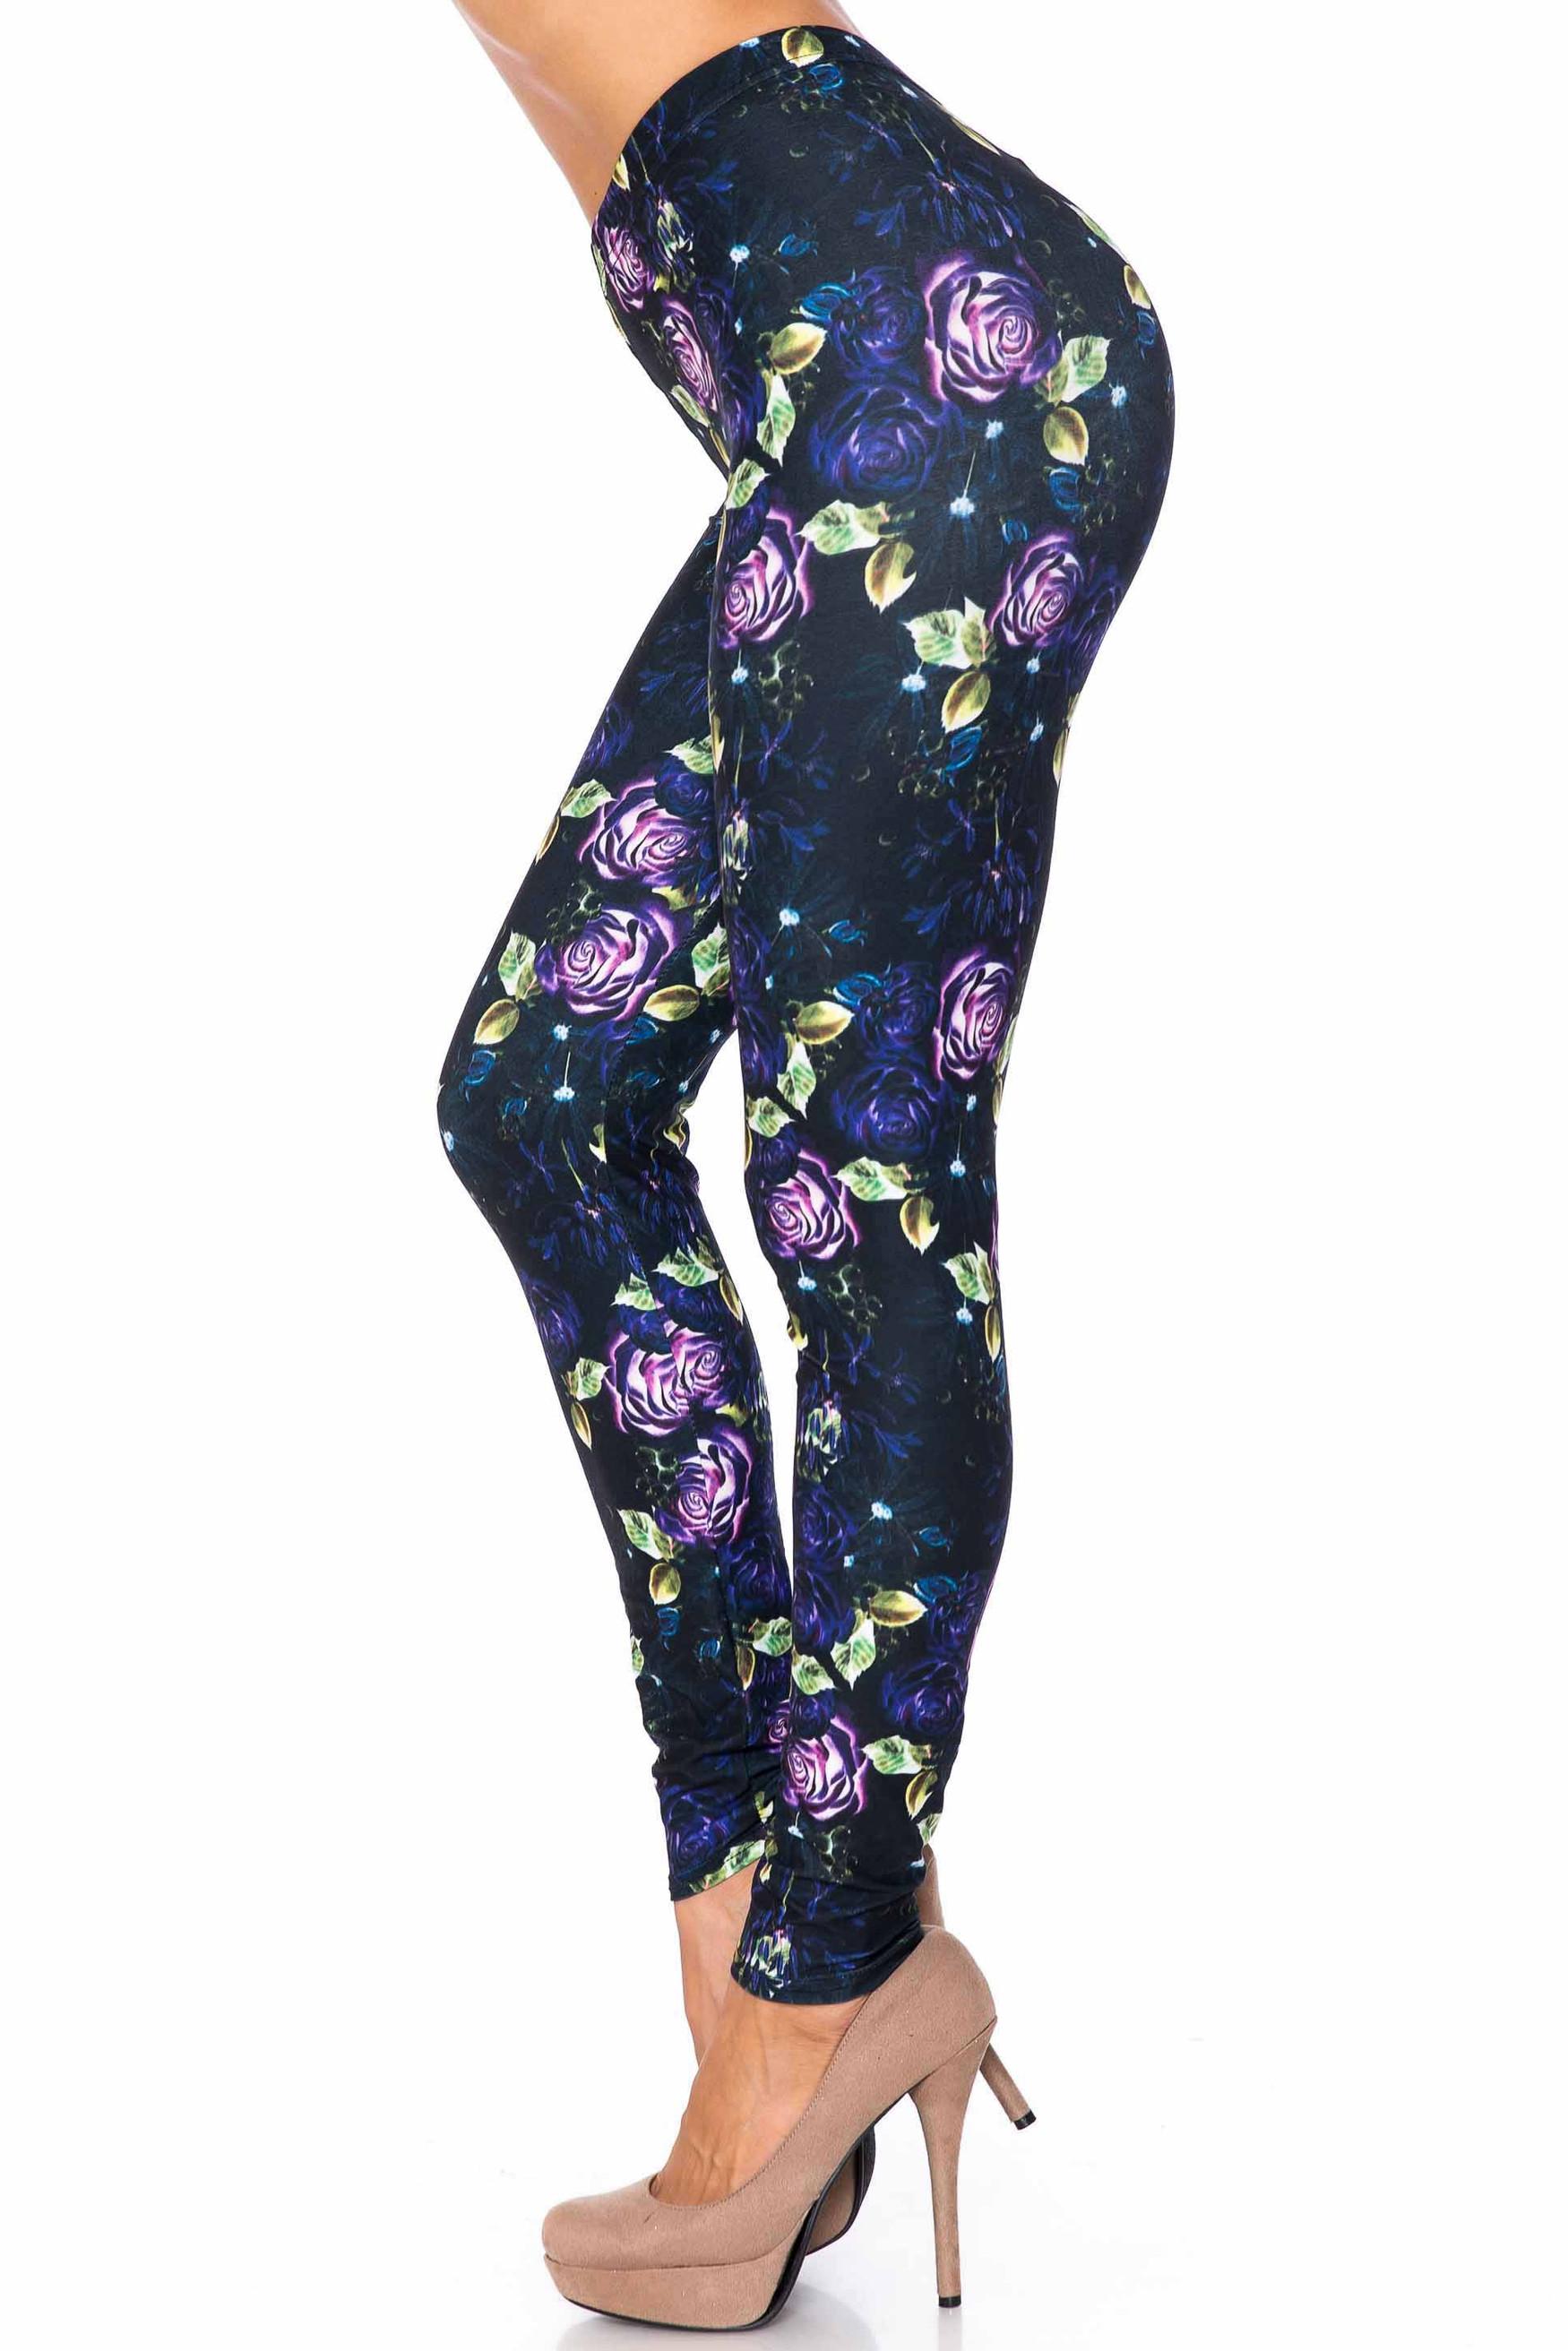 Creamy Soft Purple and Violet Rose Leggings - USA Fashion™